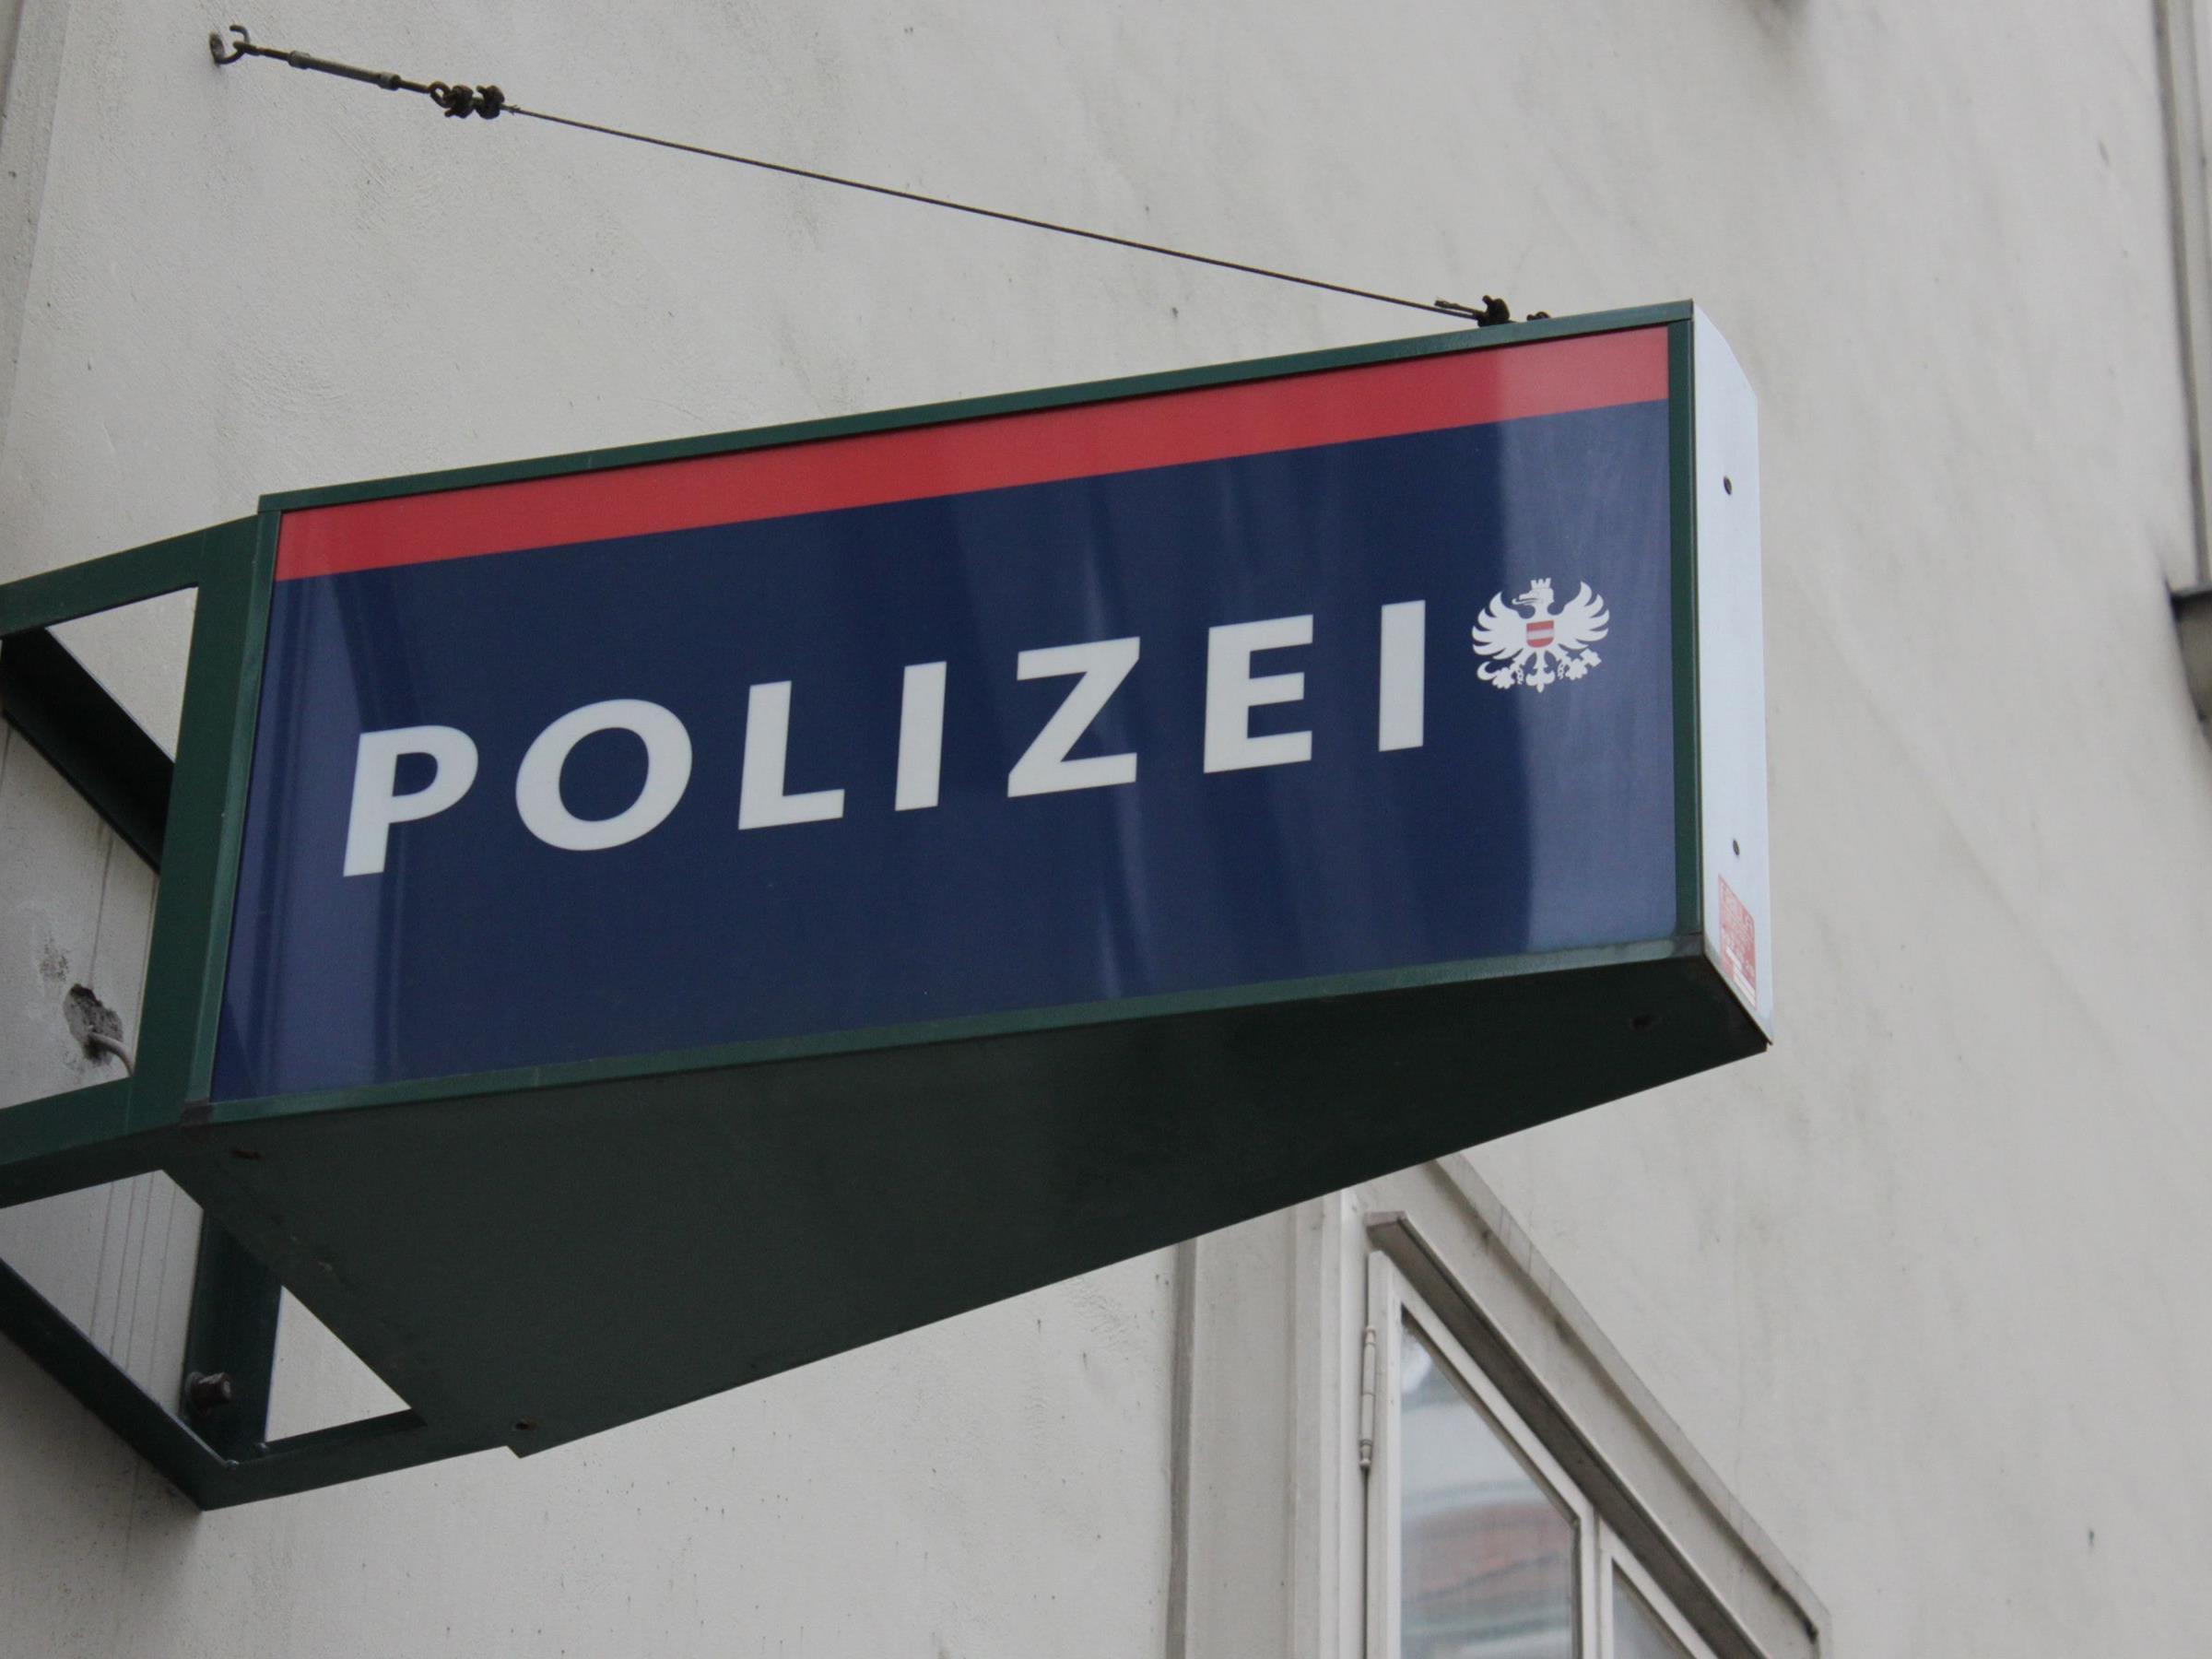 Überfall in der Donaustadt: Fahndung verlied negativ